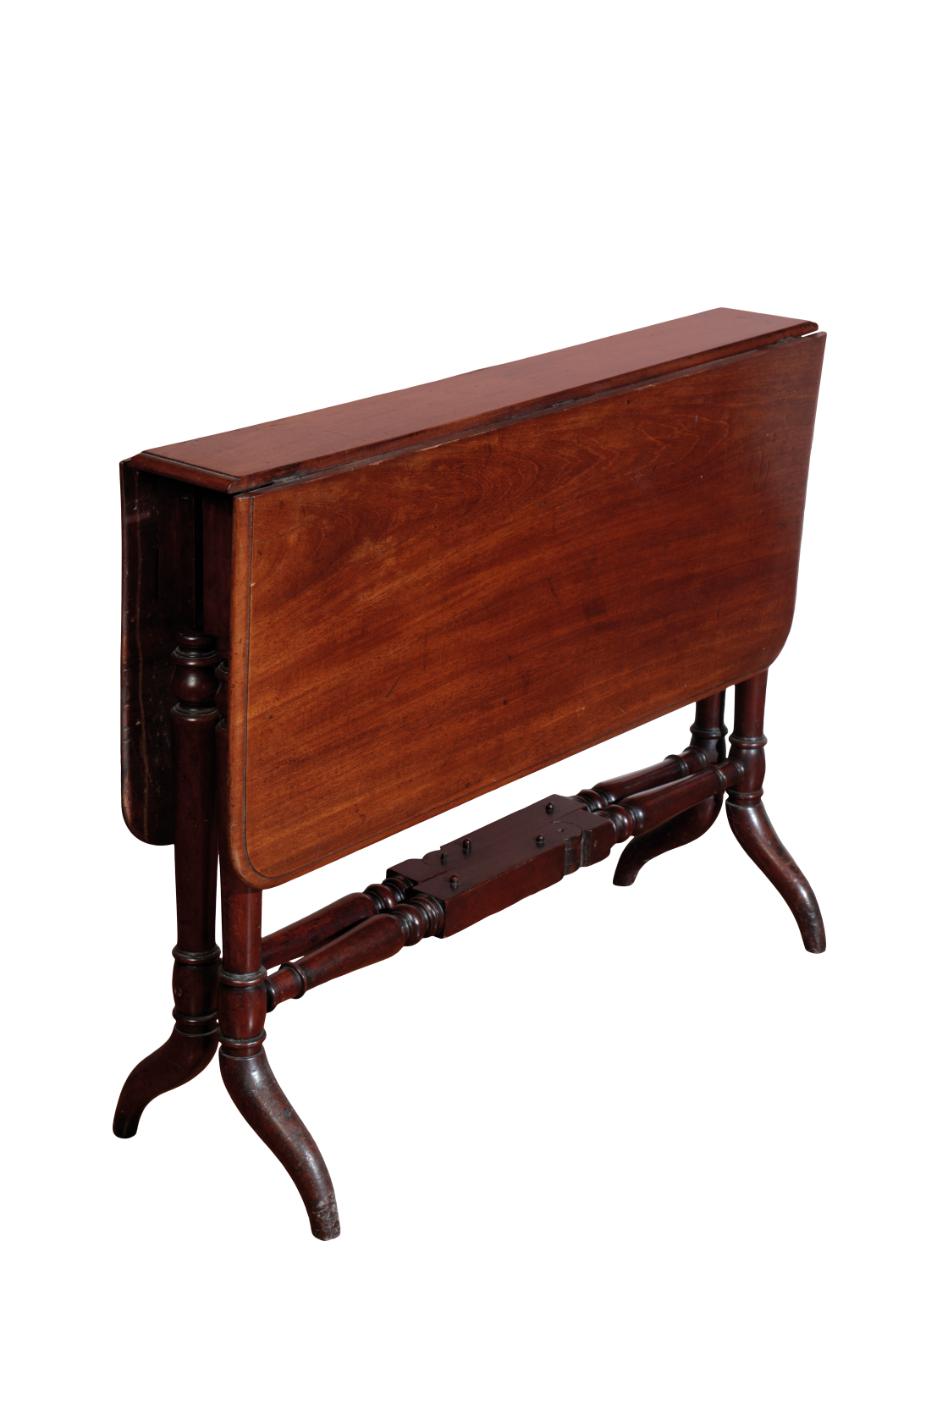 A MAHOGANY SUTHERLAND TABLE, - Image 2 of 3